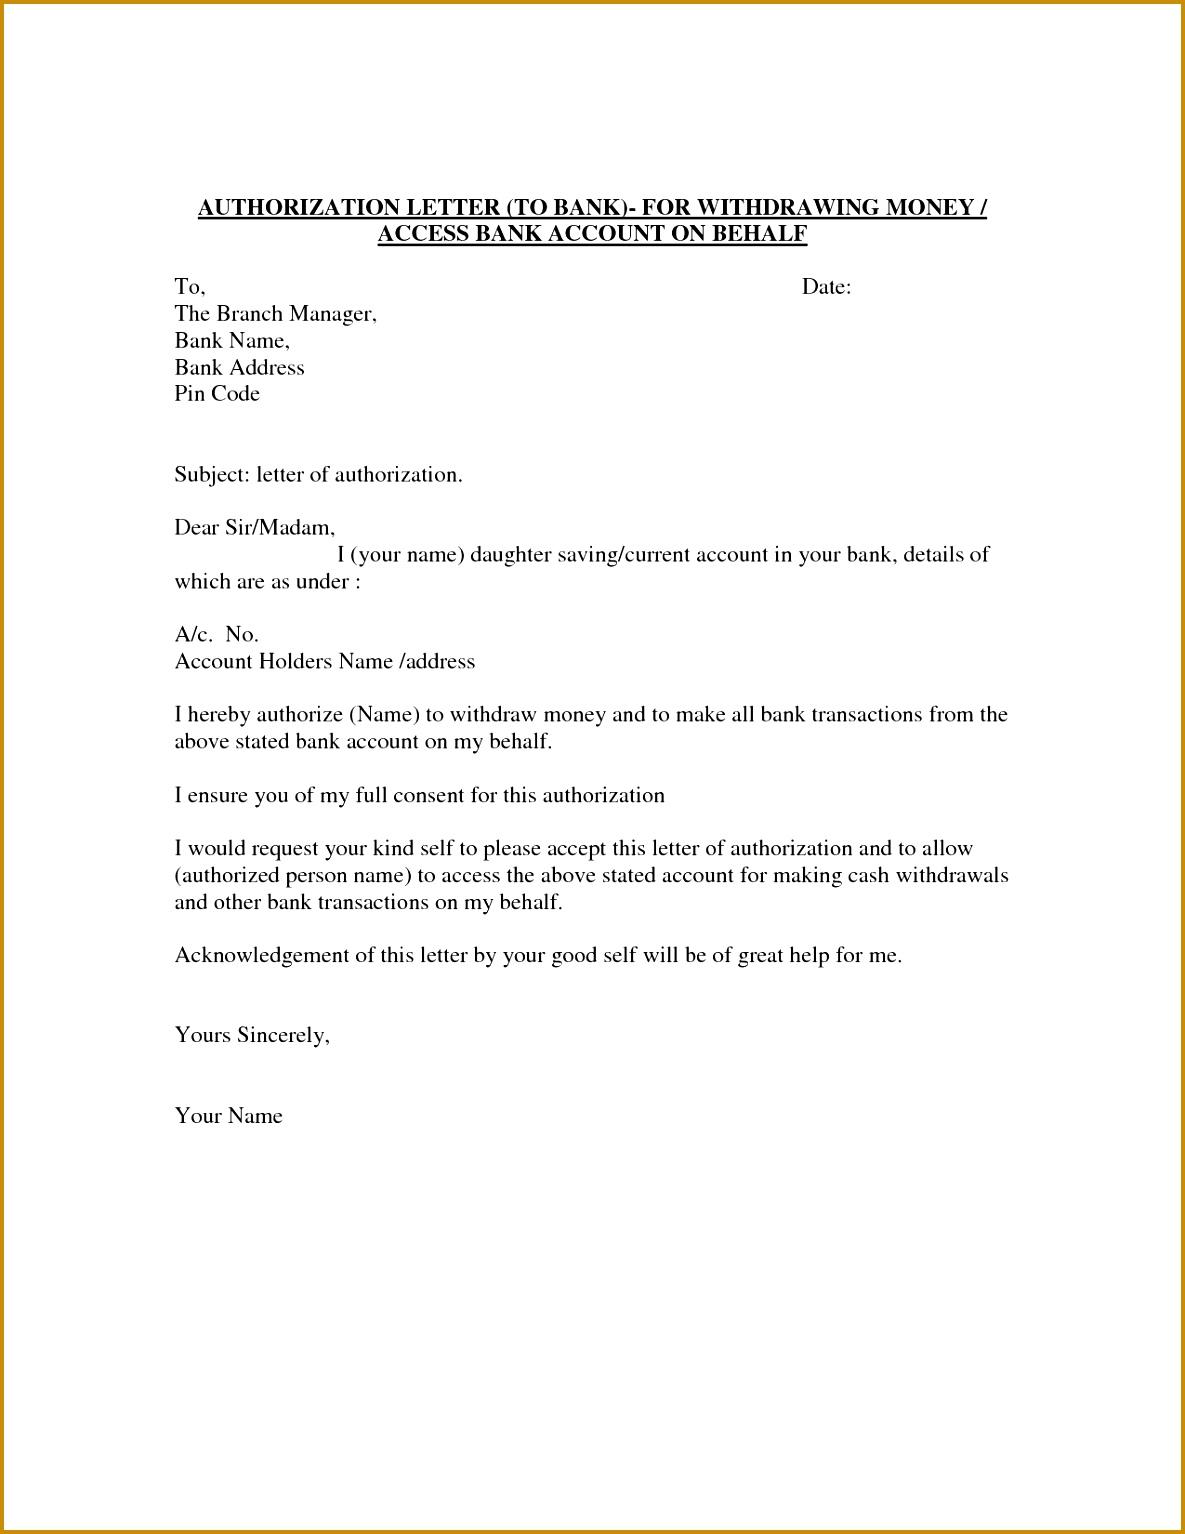 Authorization Letter Template Best Car Galleryformal Letter Authorization Letter Sample Bank Transaction 15341185